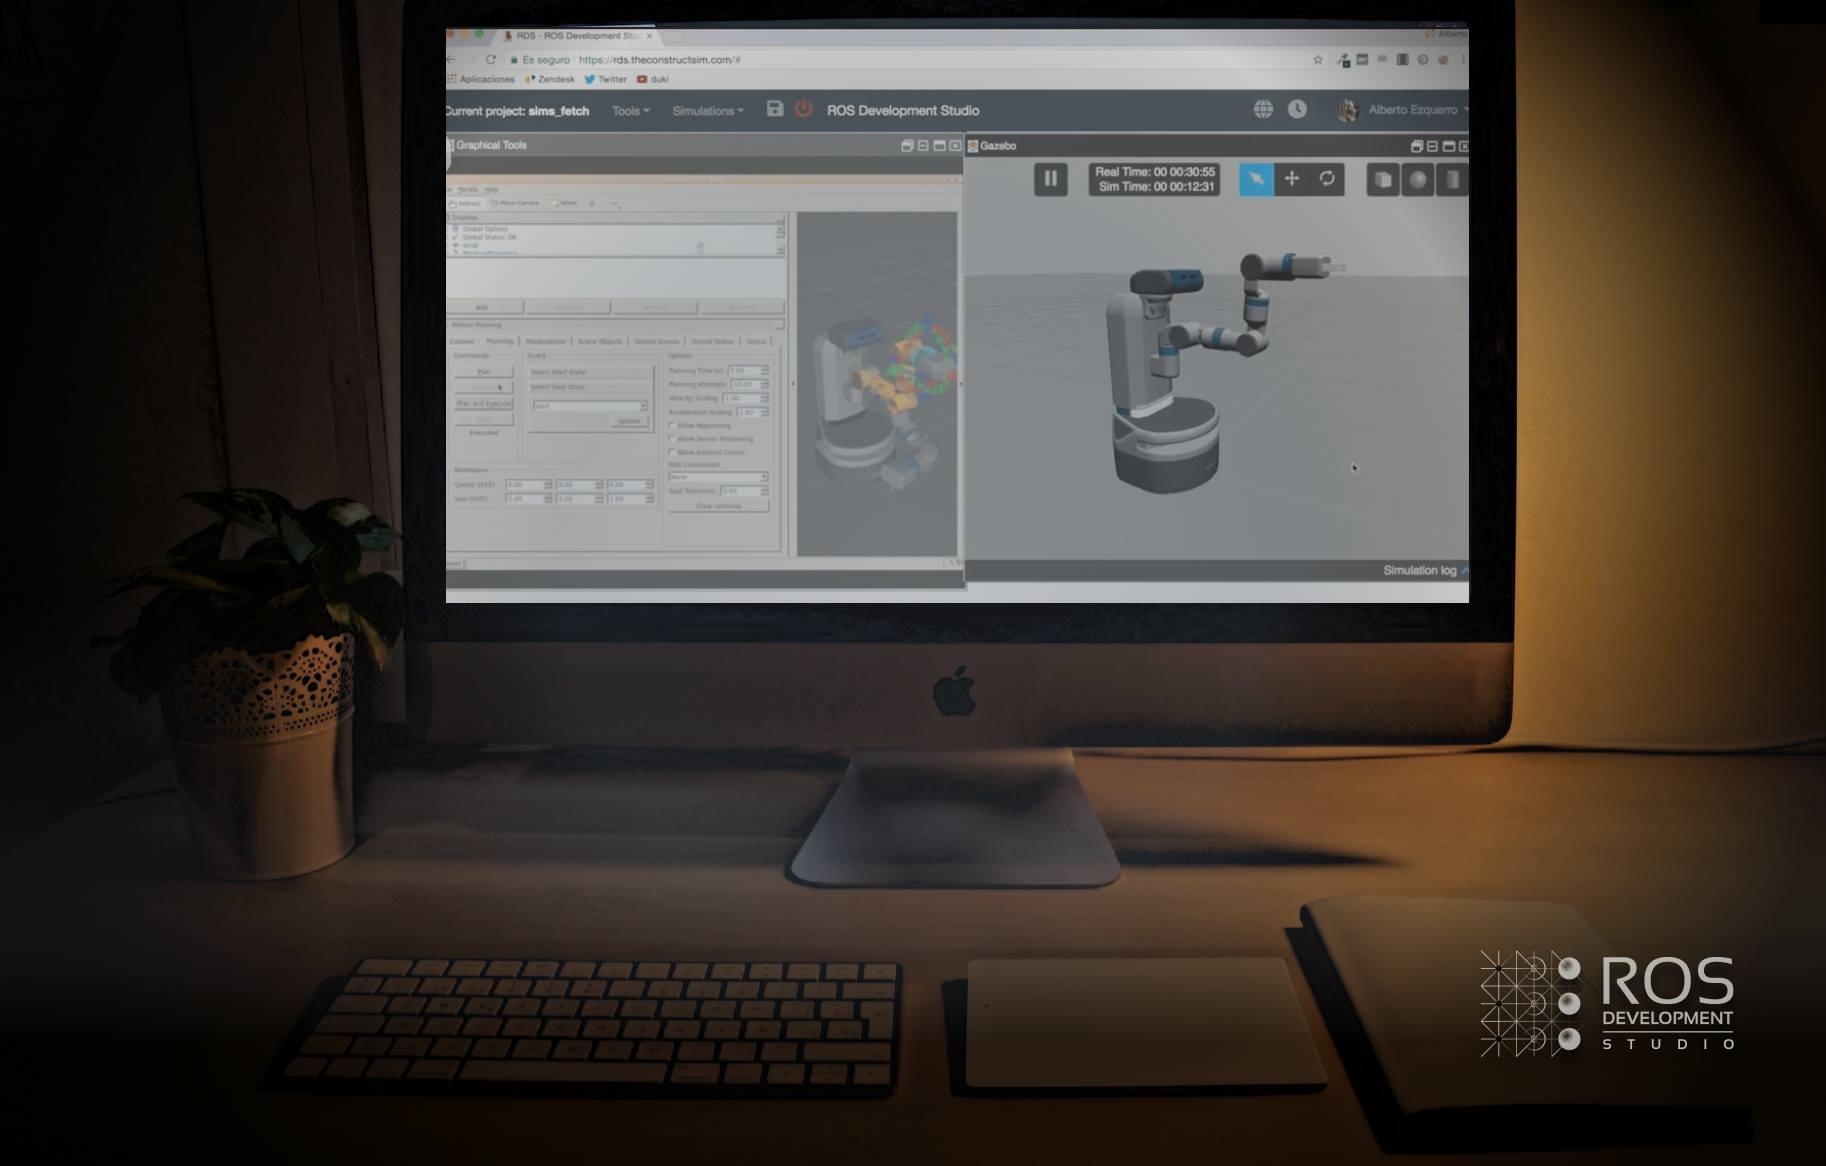 ros_development_studio_robotics_ROS_Raspberry_Pi_post